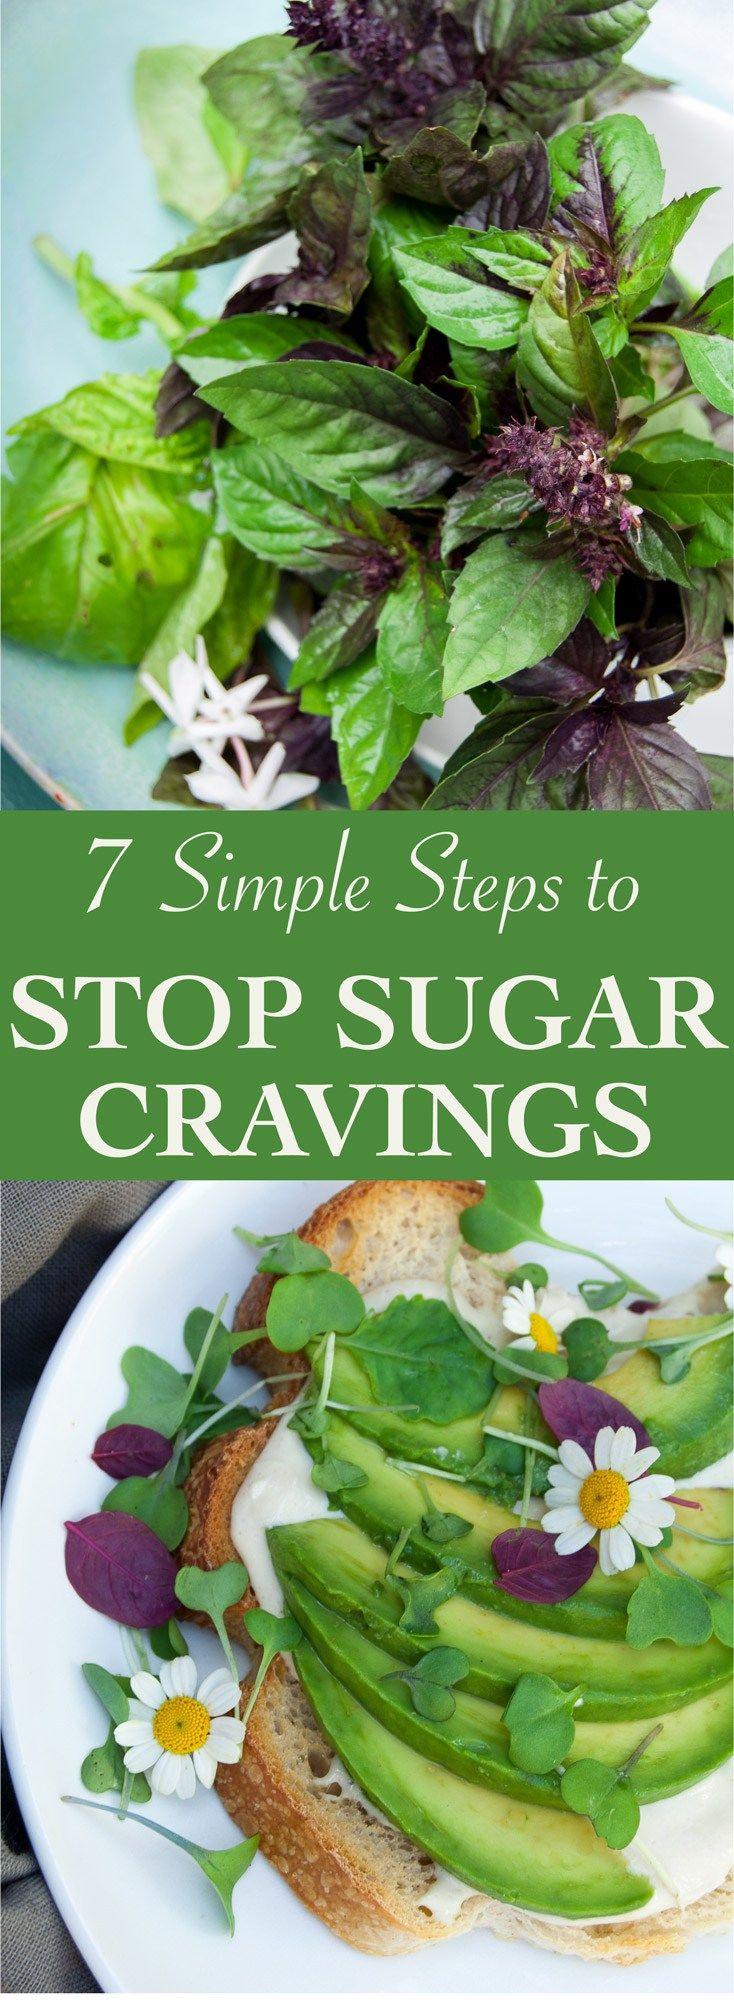 Best Pills To Stop Food Cravings